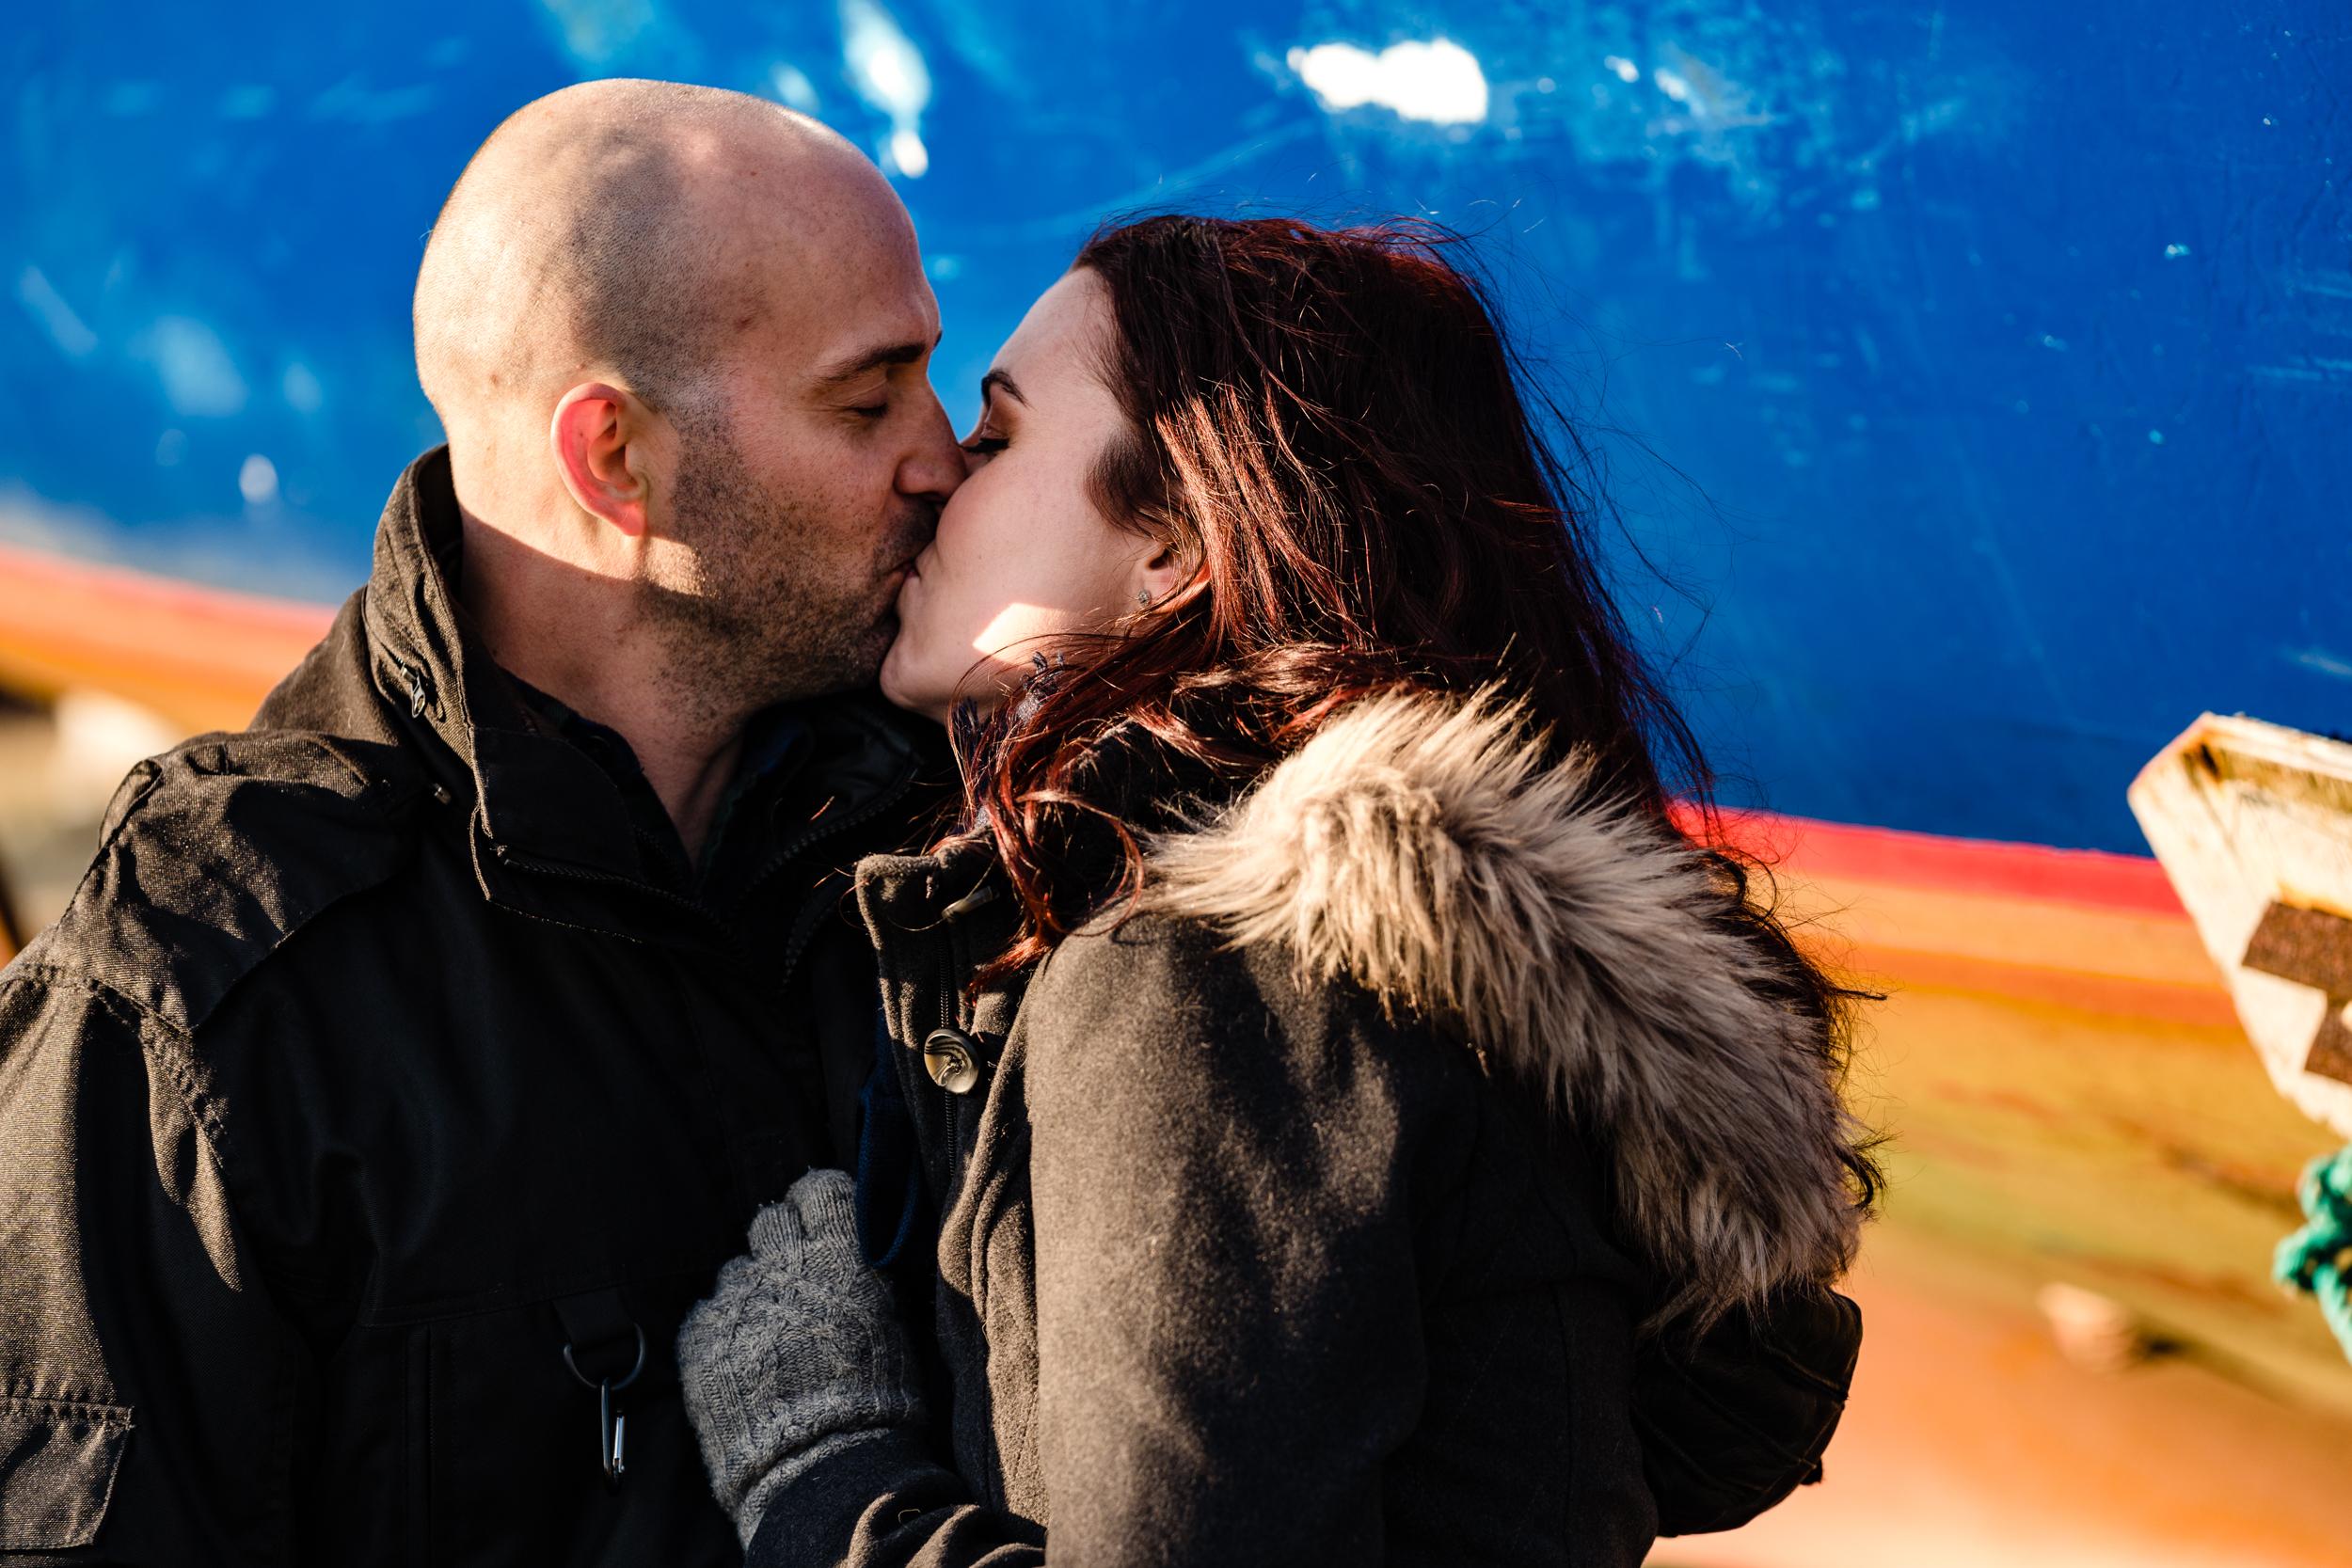 Sarah&Shayne-Halifax-engagement-weddingphotography-weddingphotographers-novascotia (11 of 41).jpg